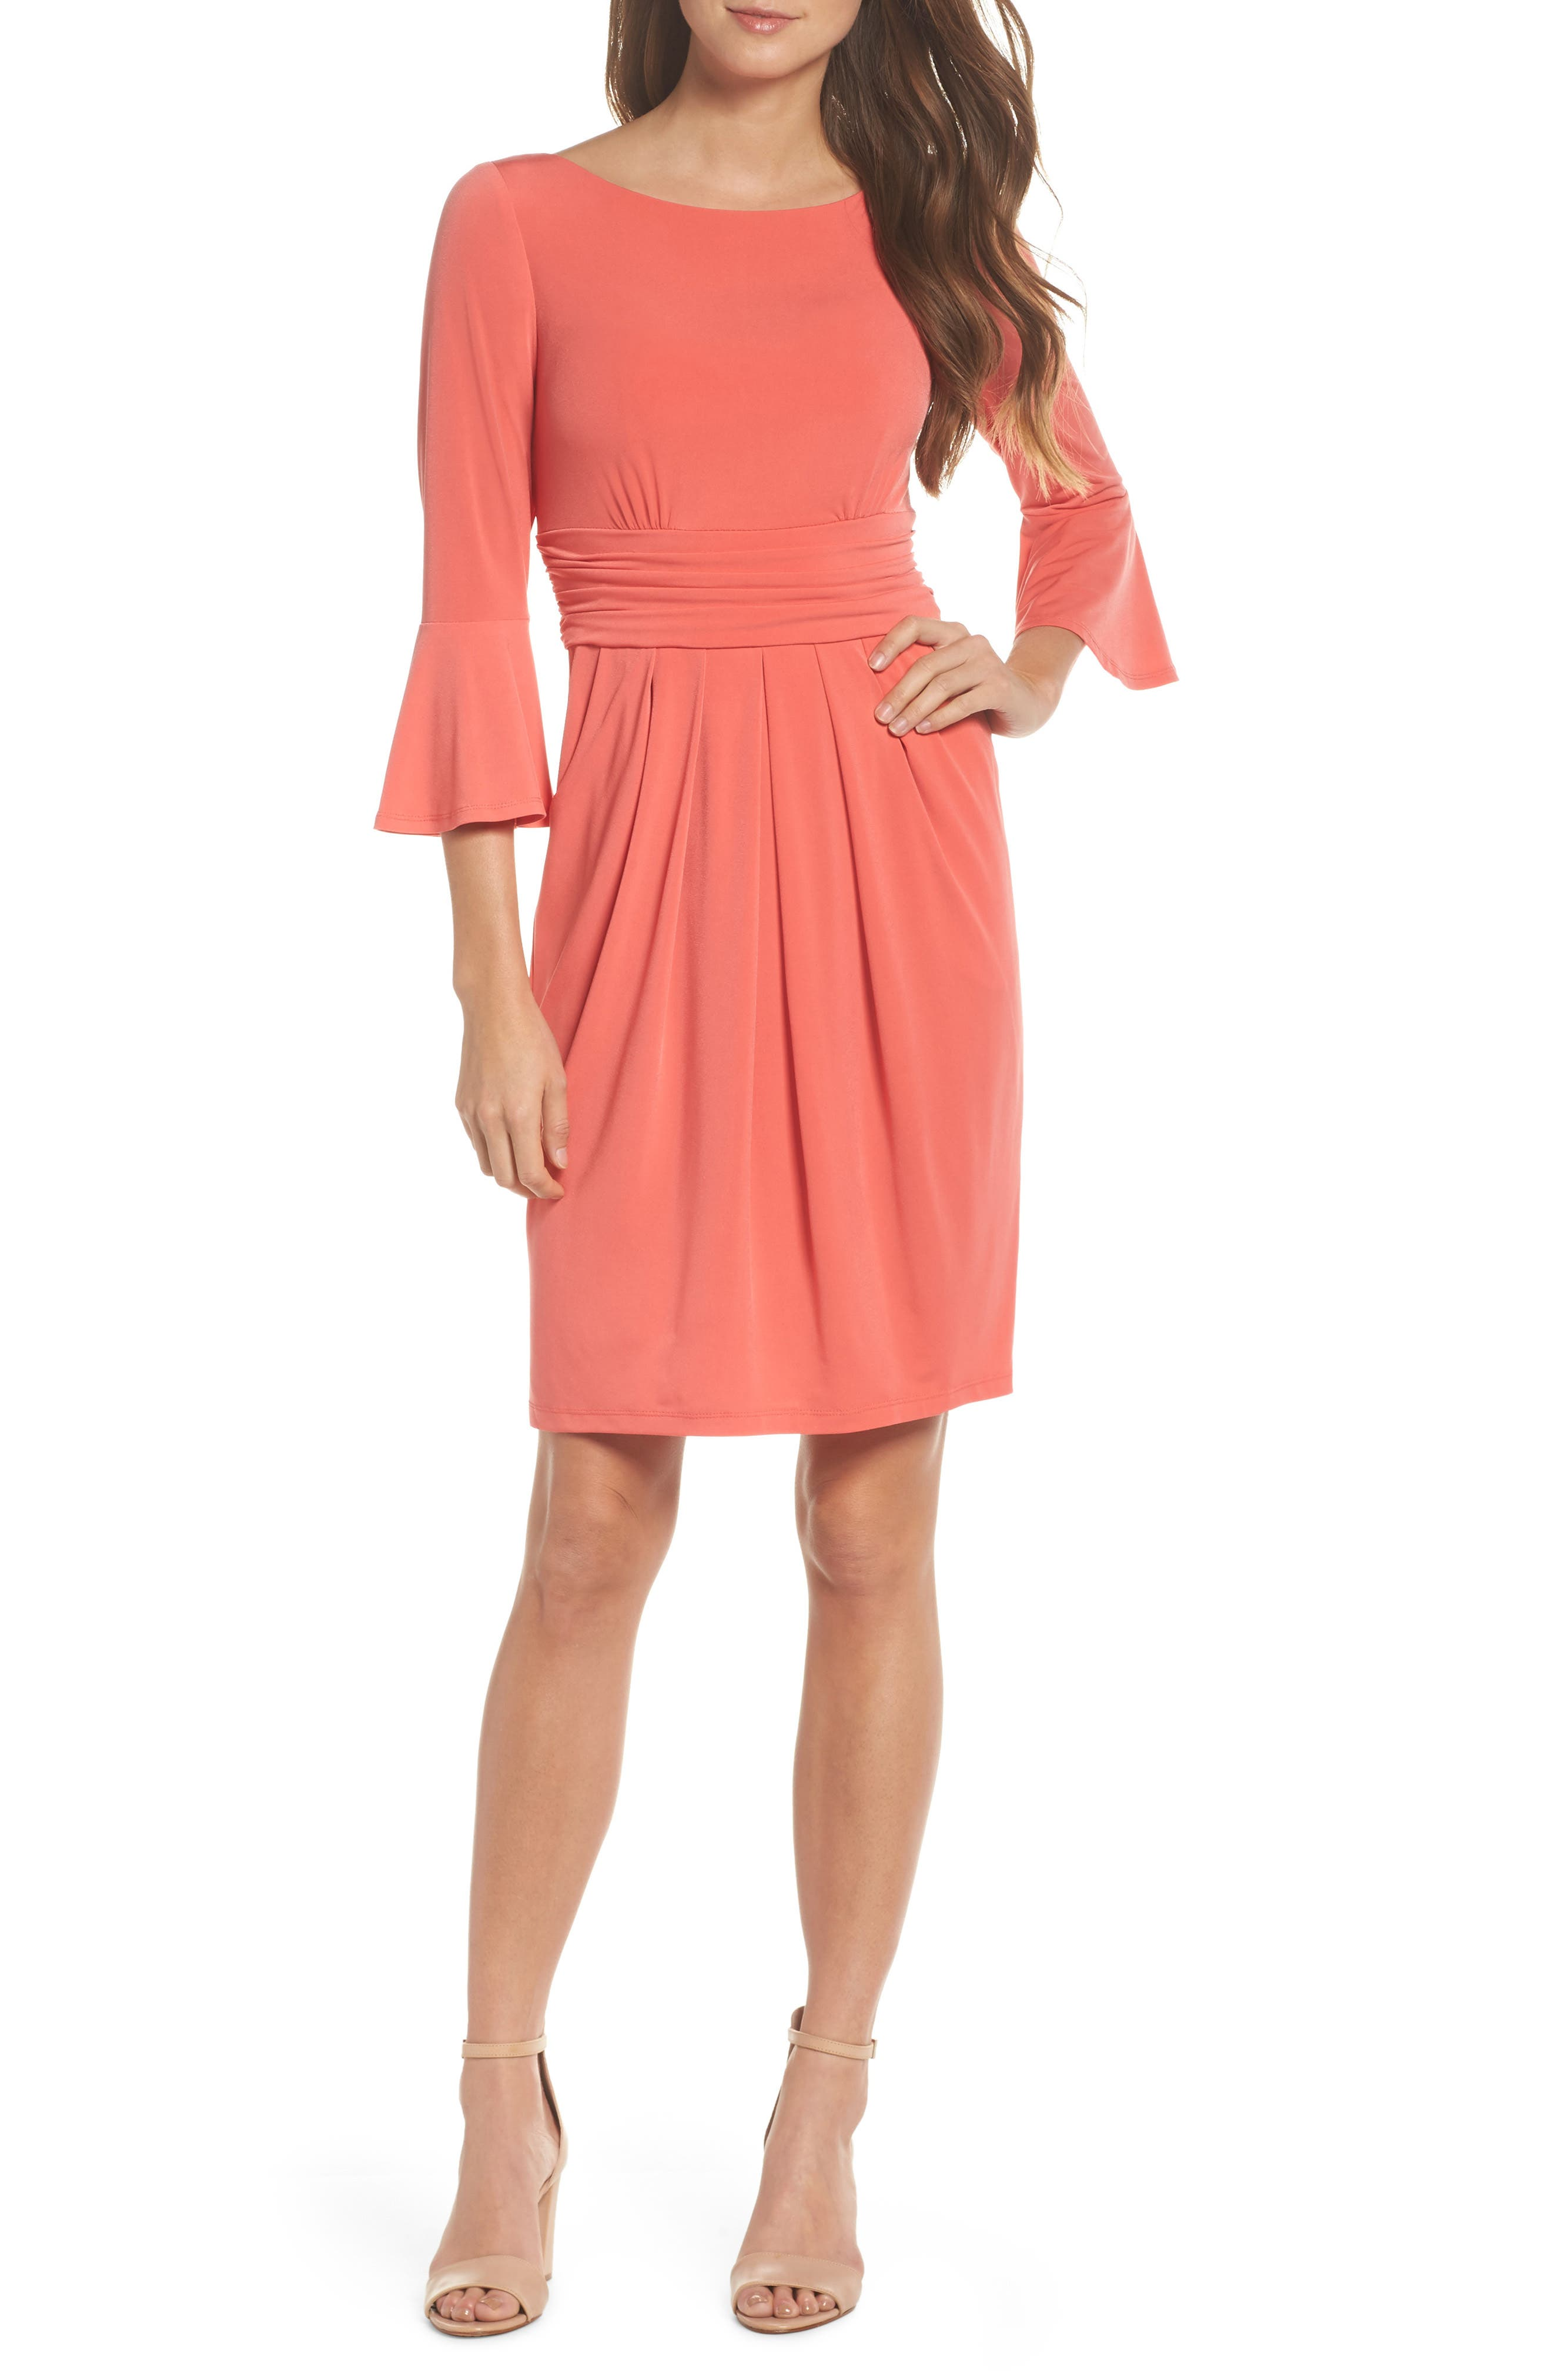 Alternate Image 1 Selected - Eliza J Flounce Sleeve Sheath Dress